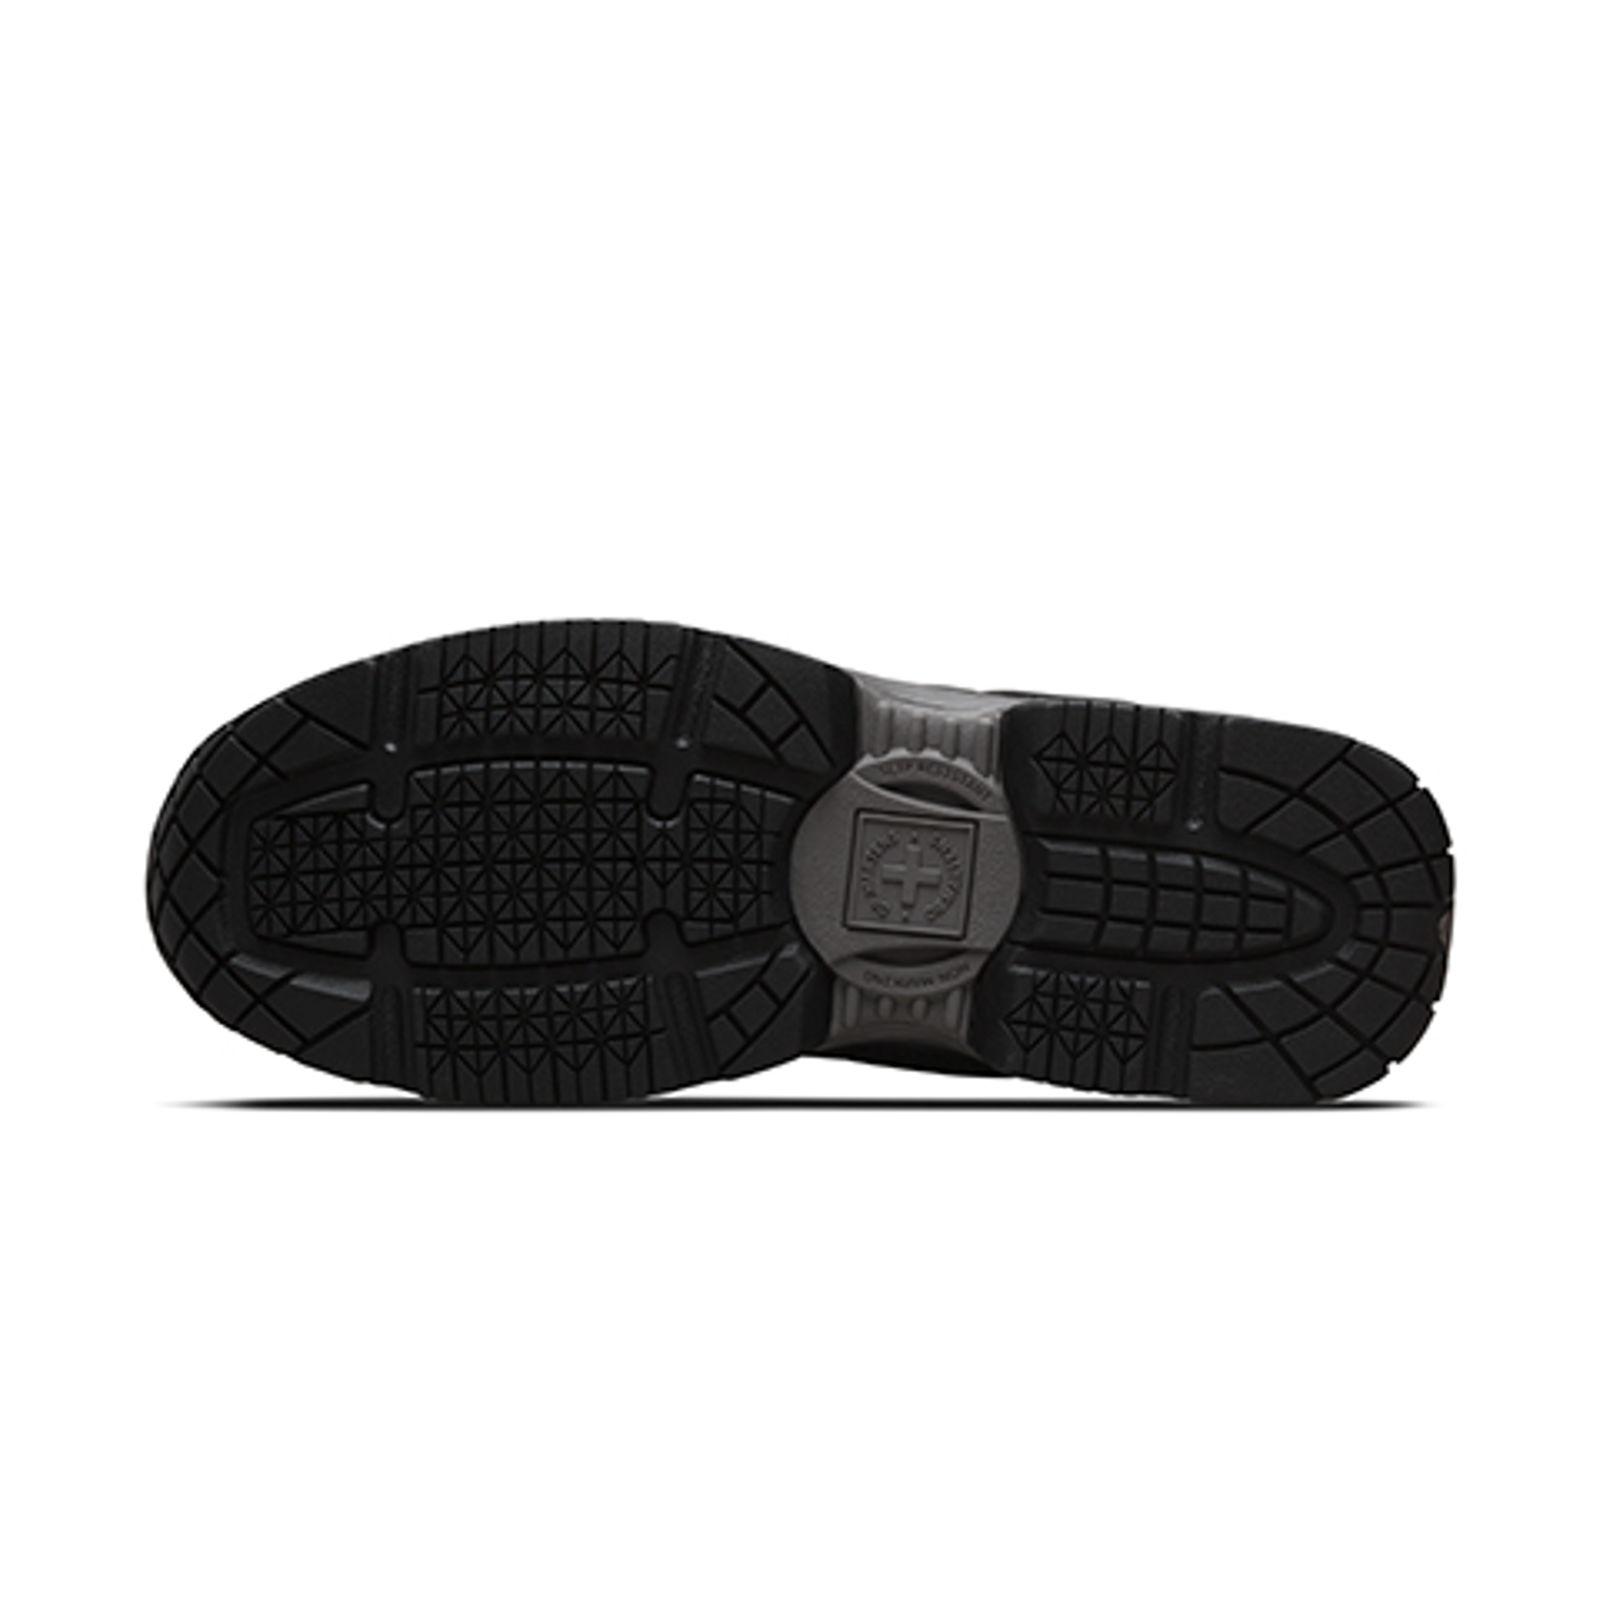 DR MARTENS Calamus S1P black DM composite safety boot with midsole size 6-13 UK